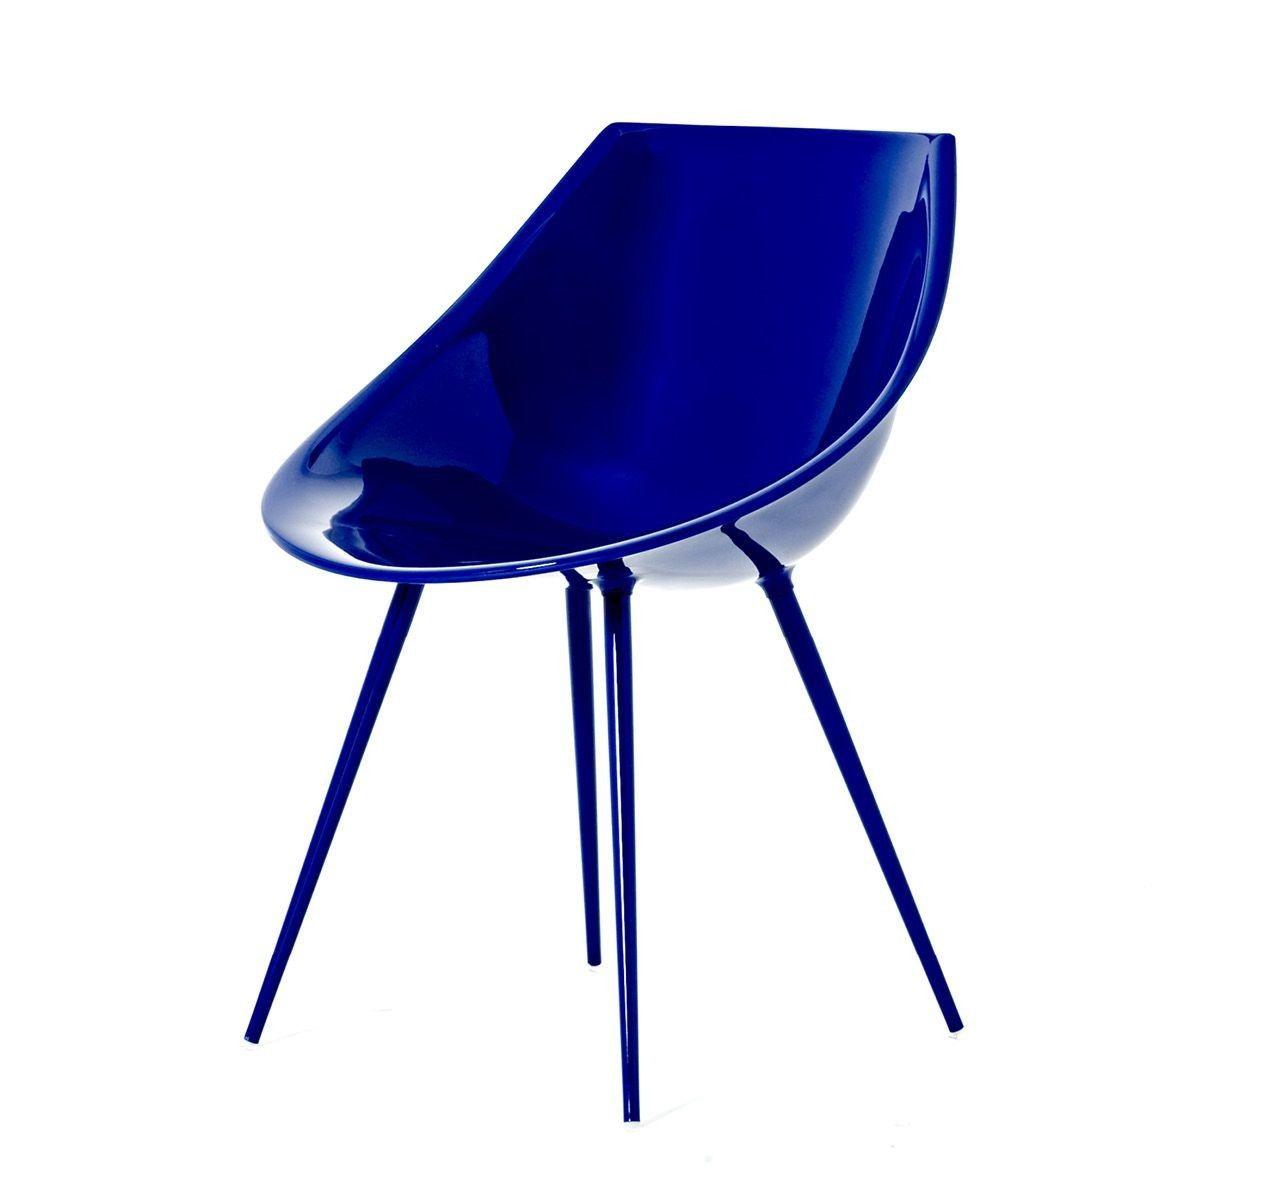 La Chaise LAGO De Driade Imaginee Par Le Celebre Designer Philippe Starck Se Caracterise